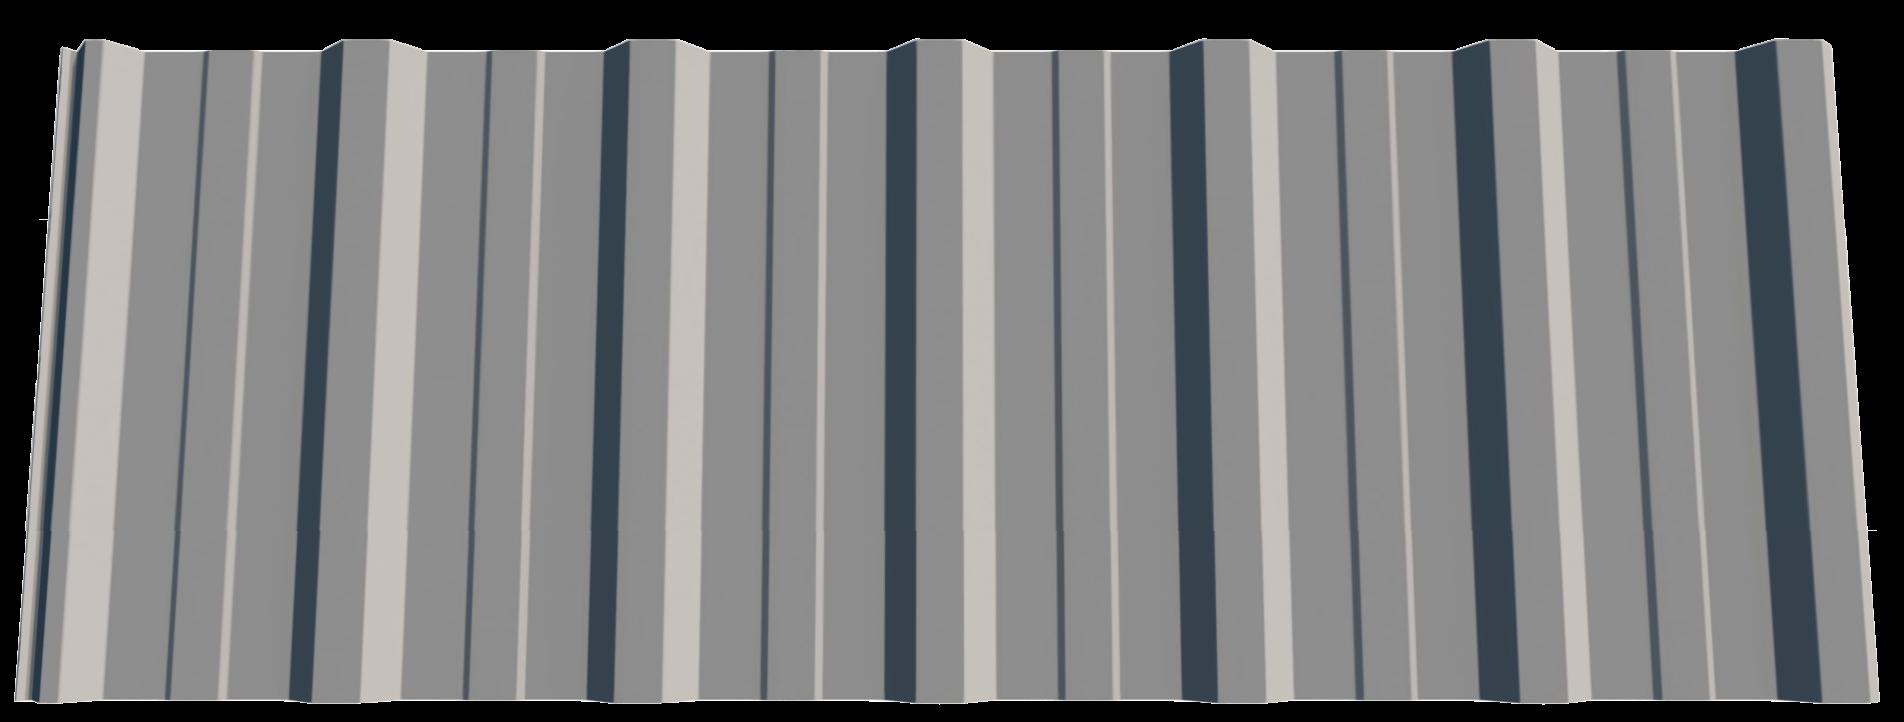 damwandplaten t18 wand